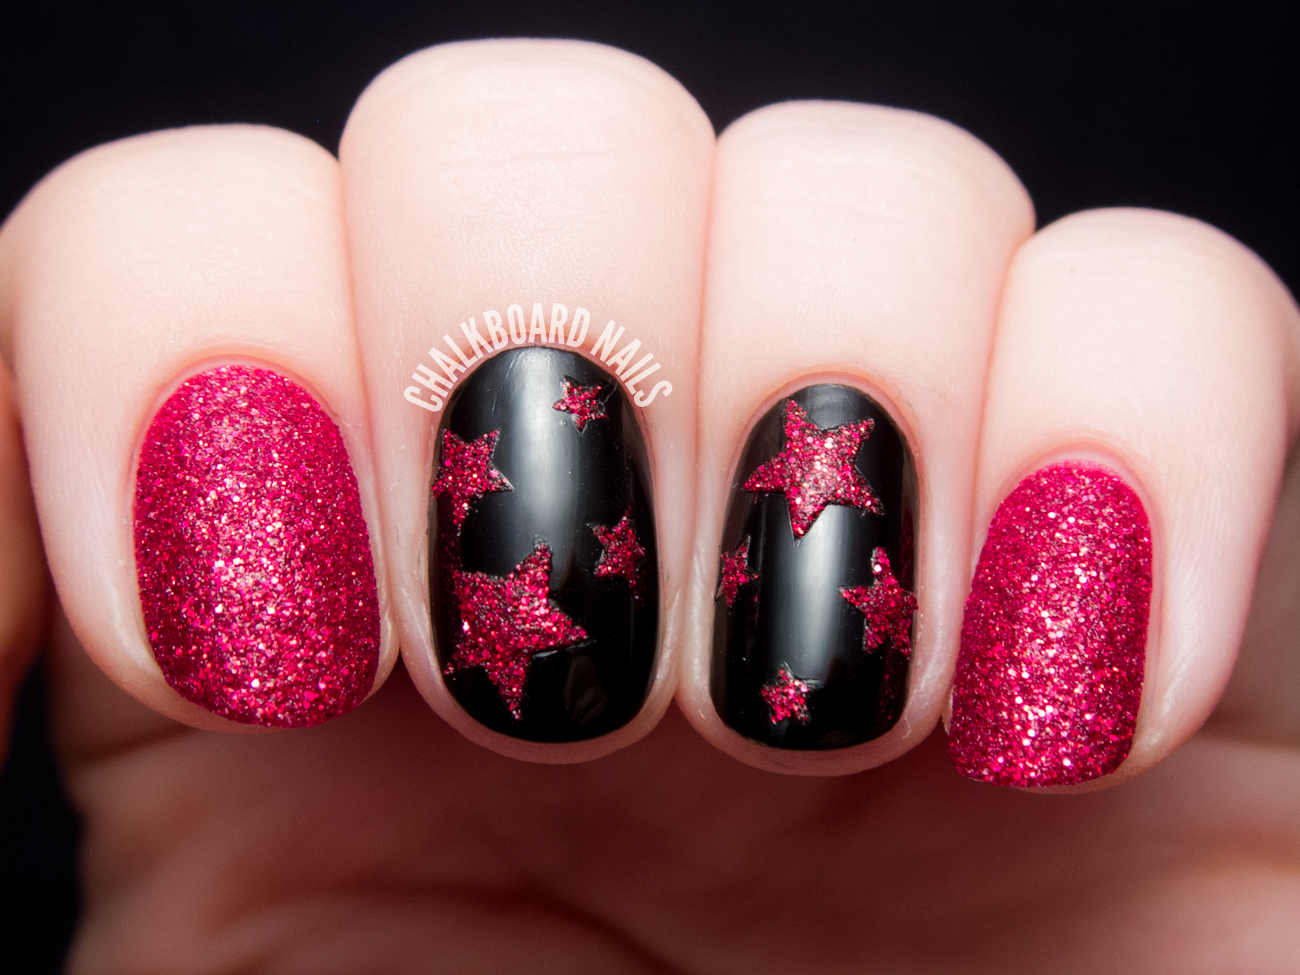 Textured Ruby Stars | Chalkboard Nails | Nail Art Blog